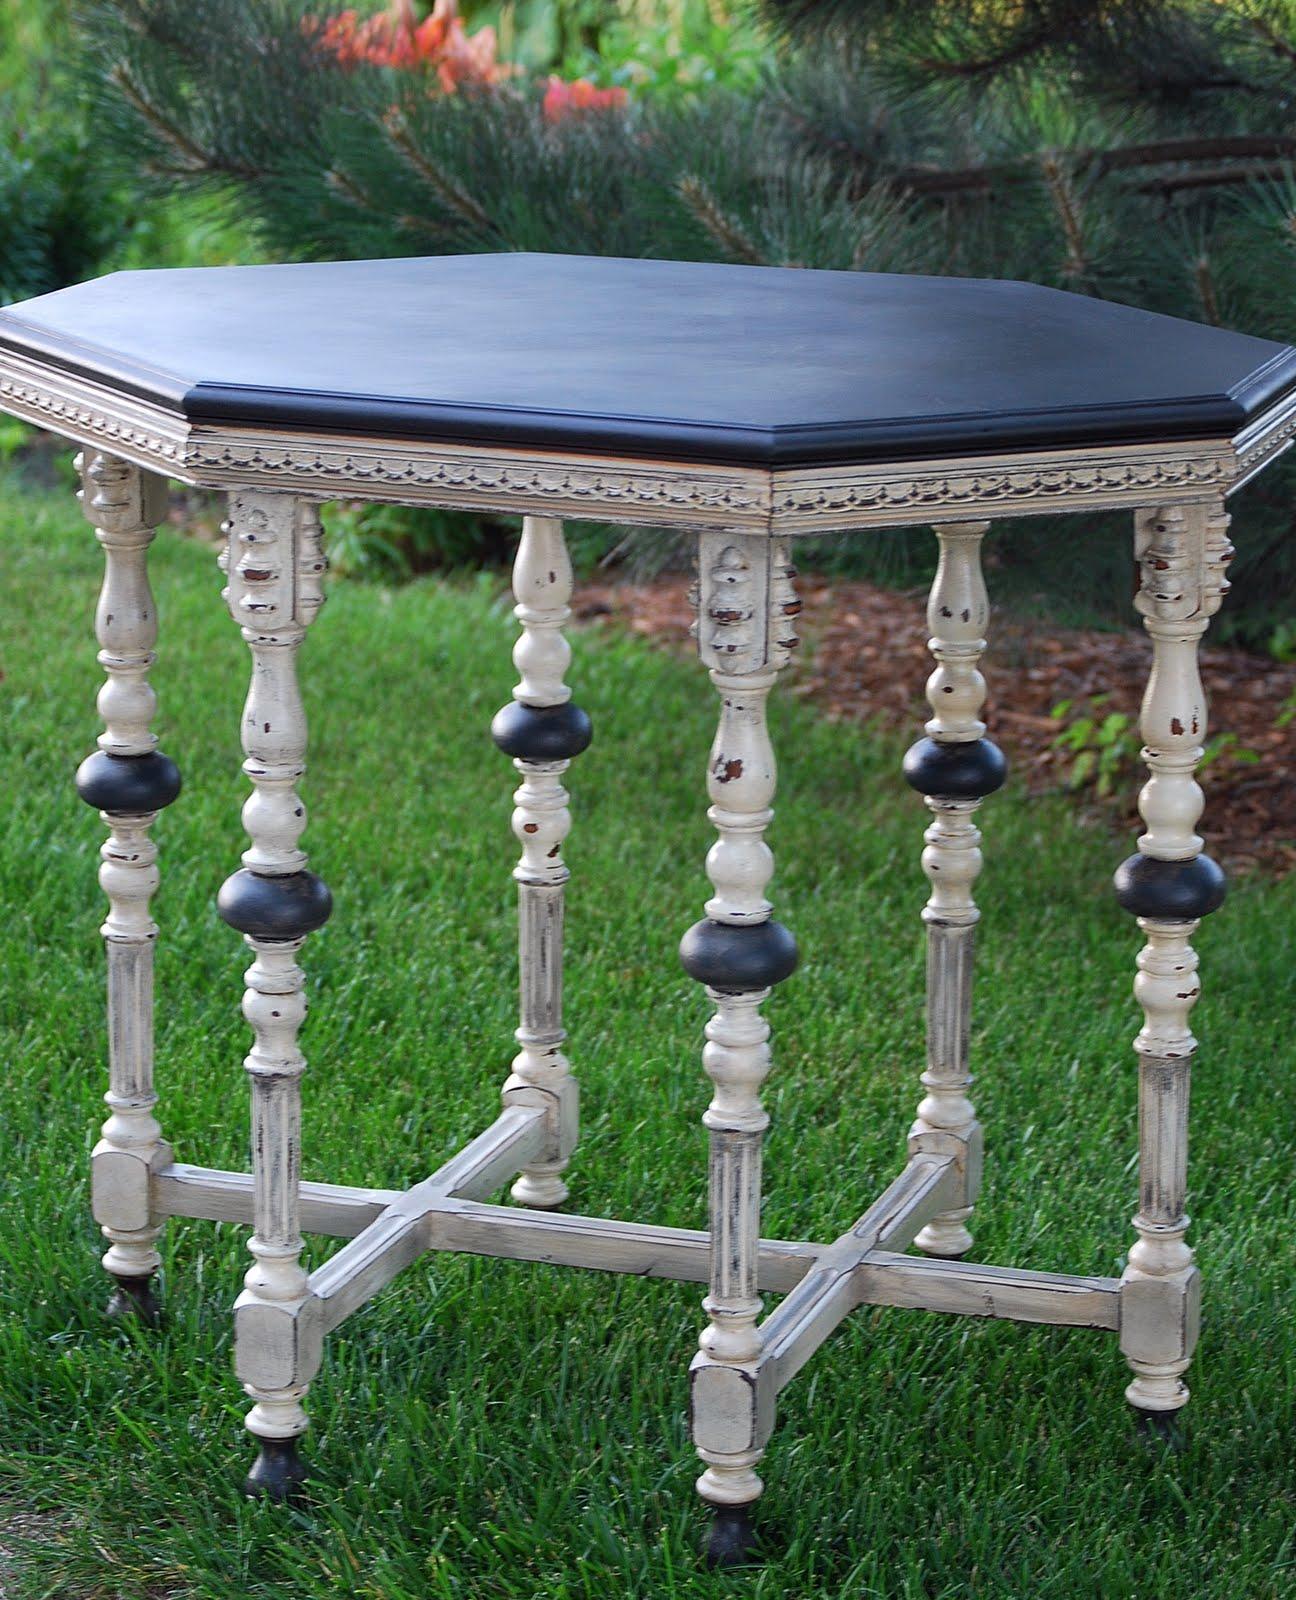 shizzle design best painted furniture reno s 2011 by shizzle design. Black Bedroom Furniture Sets. Home Design Ideas